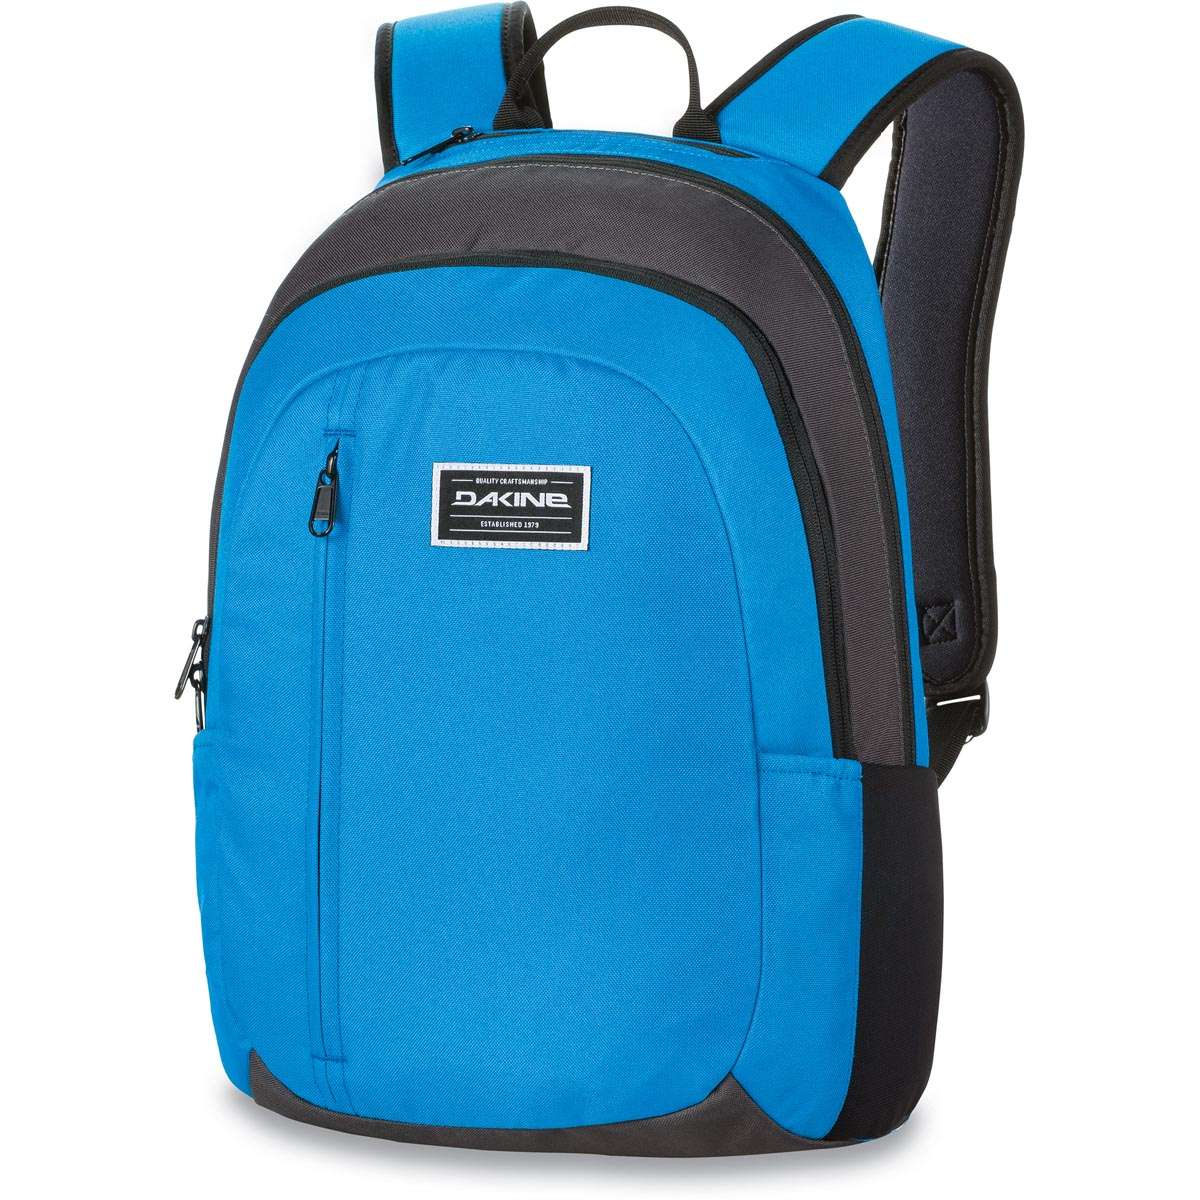 3bdd72ec78e Dakine Factor 22L Backpack Blue | Dakine Shop